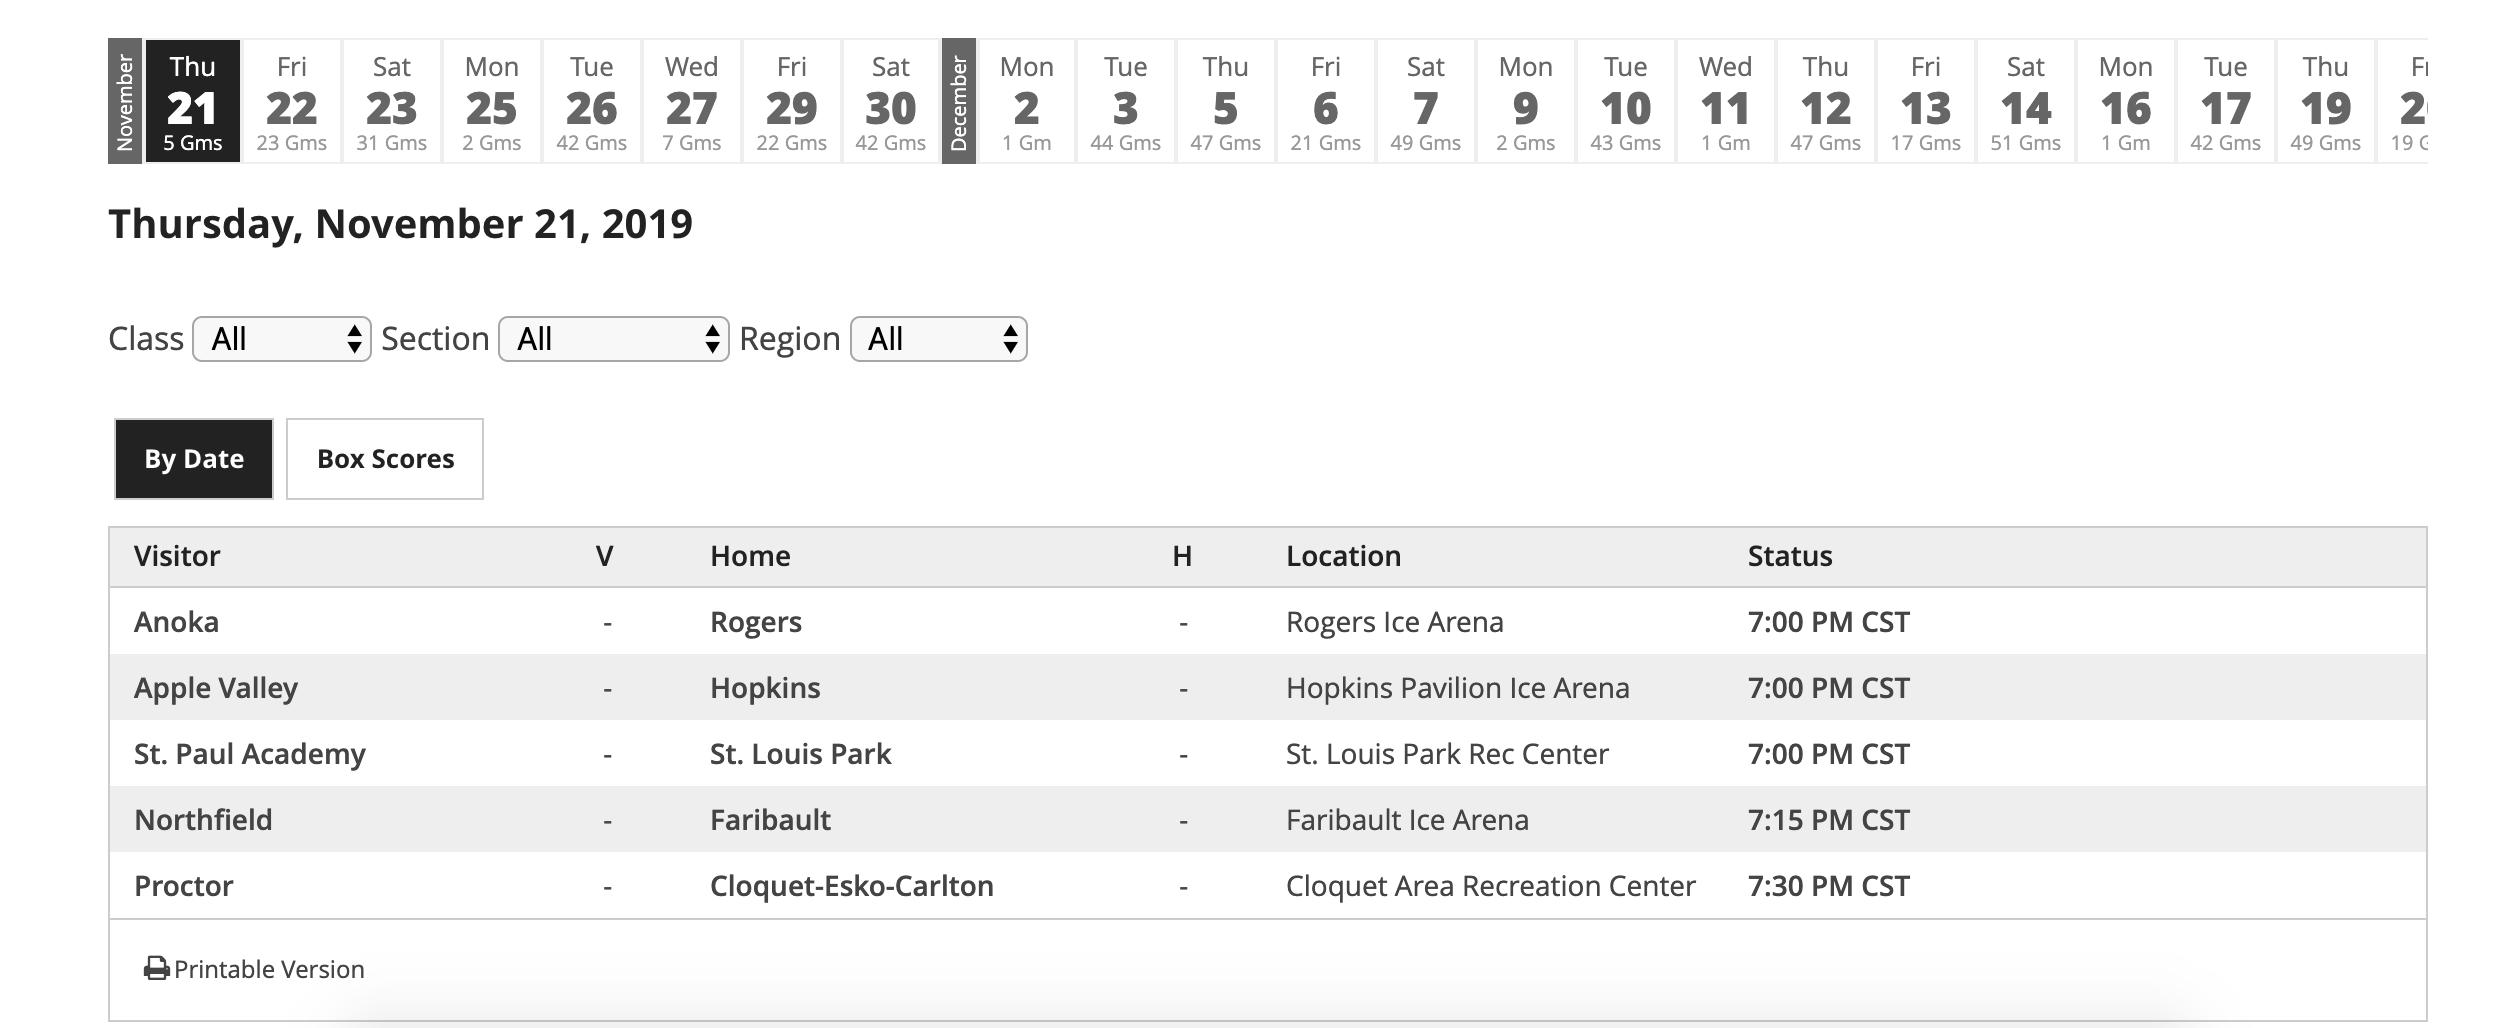 2019 20 Minnesota High School Boys' Hockey Schedules Released With Grand Rapids Public School Calendar